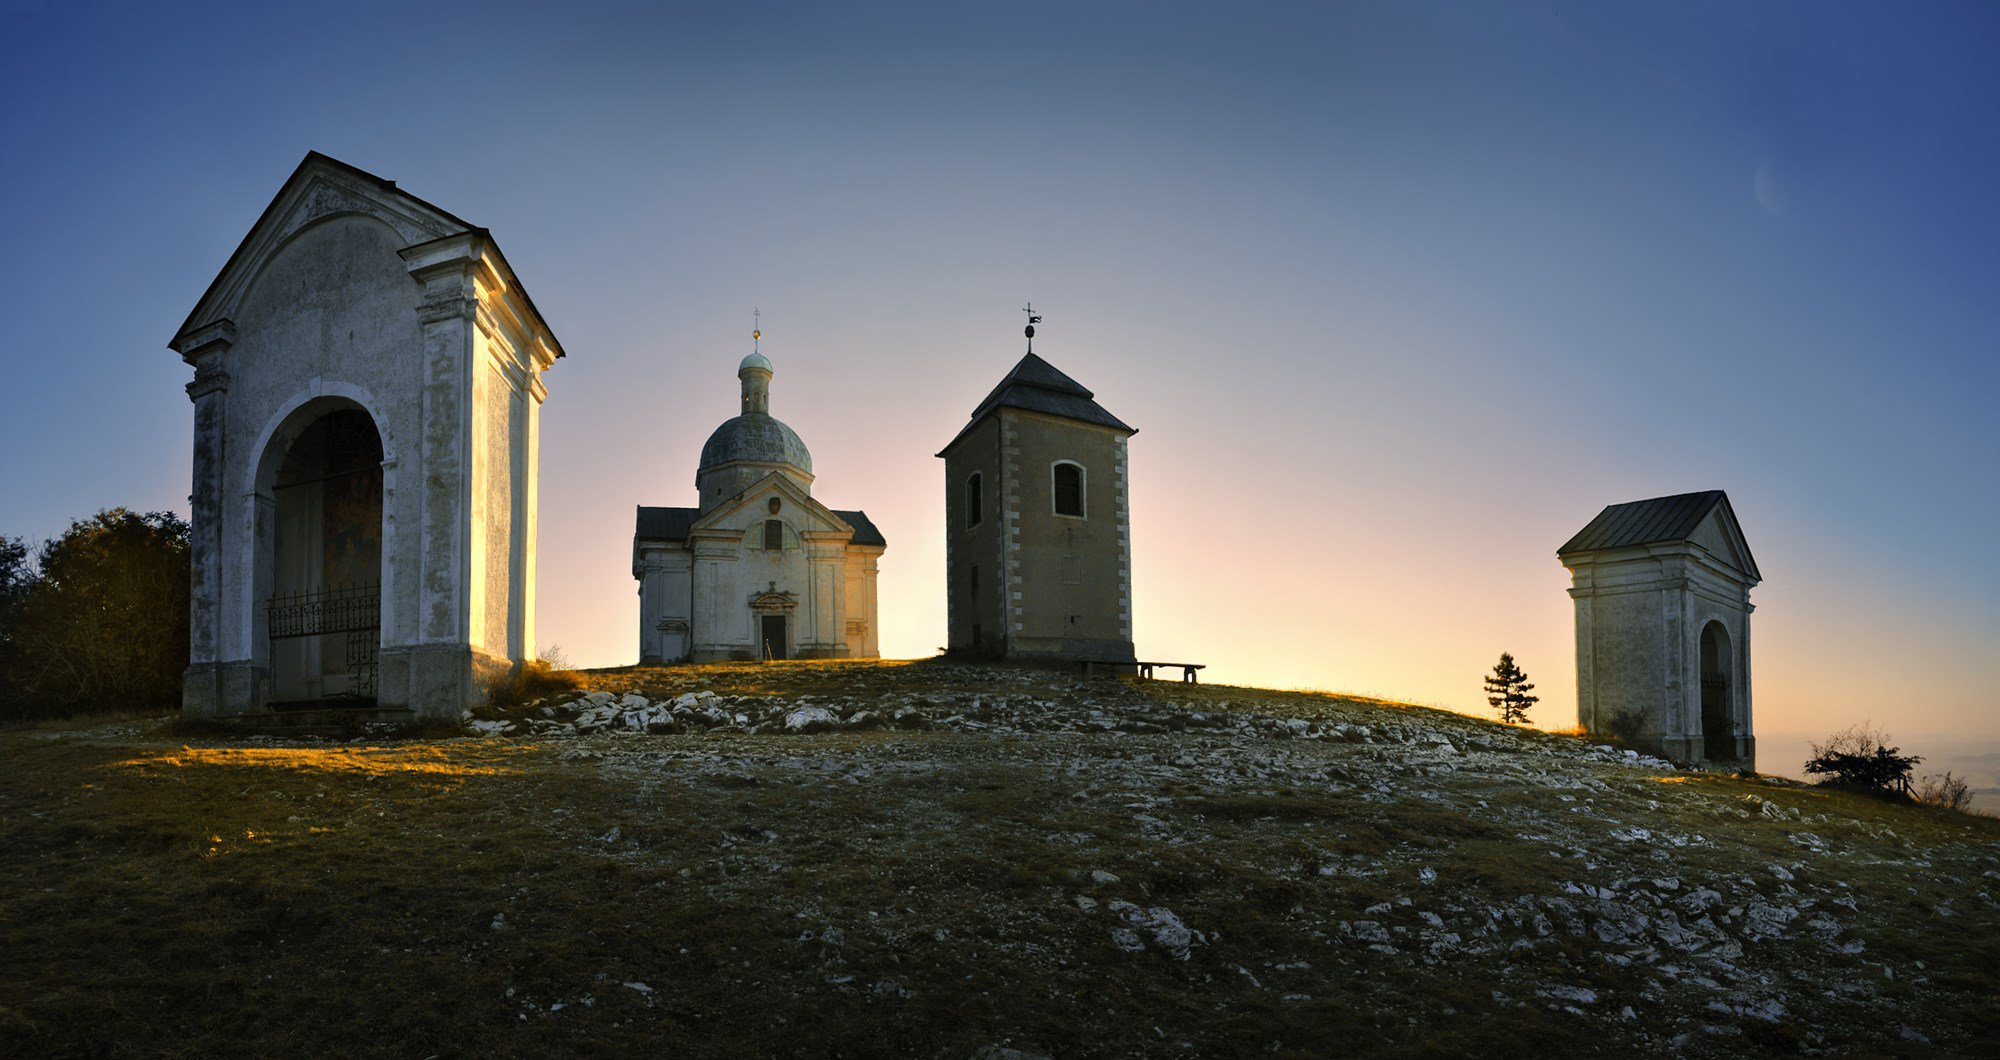 Svaty-kopecek-Mikulov-Ladislav-Renner